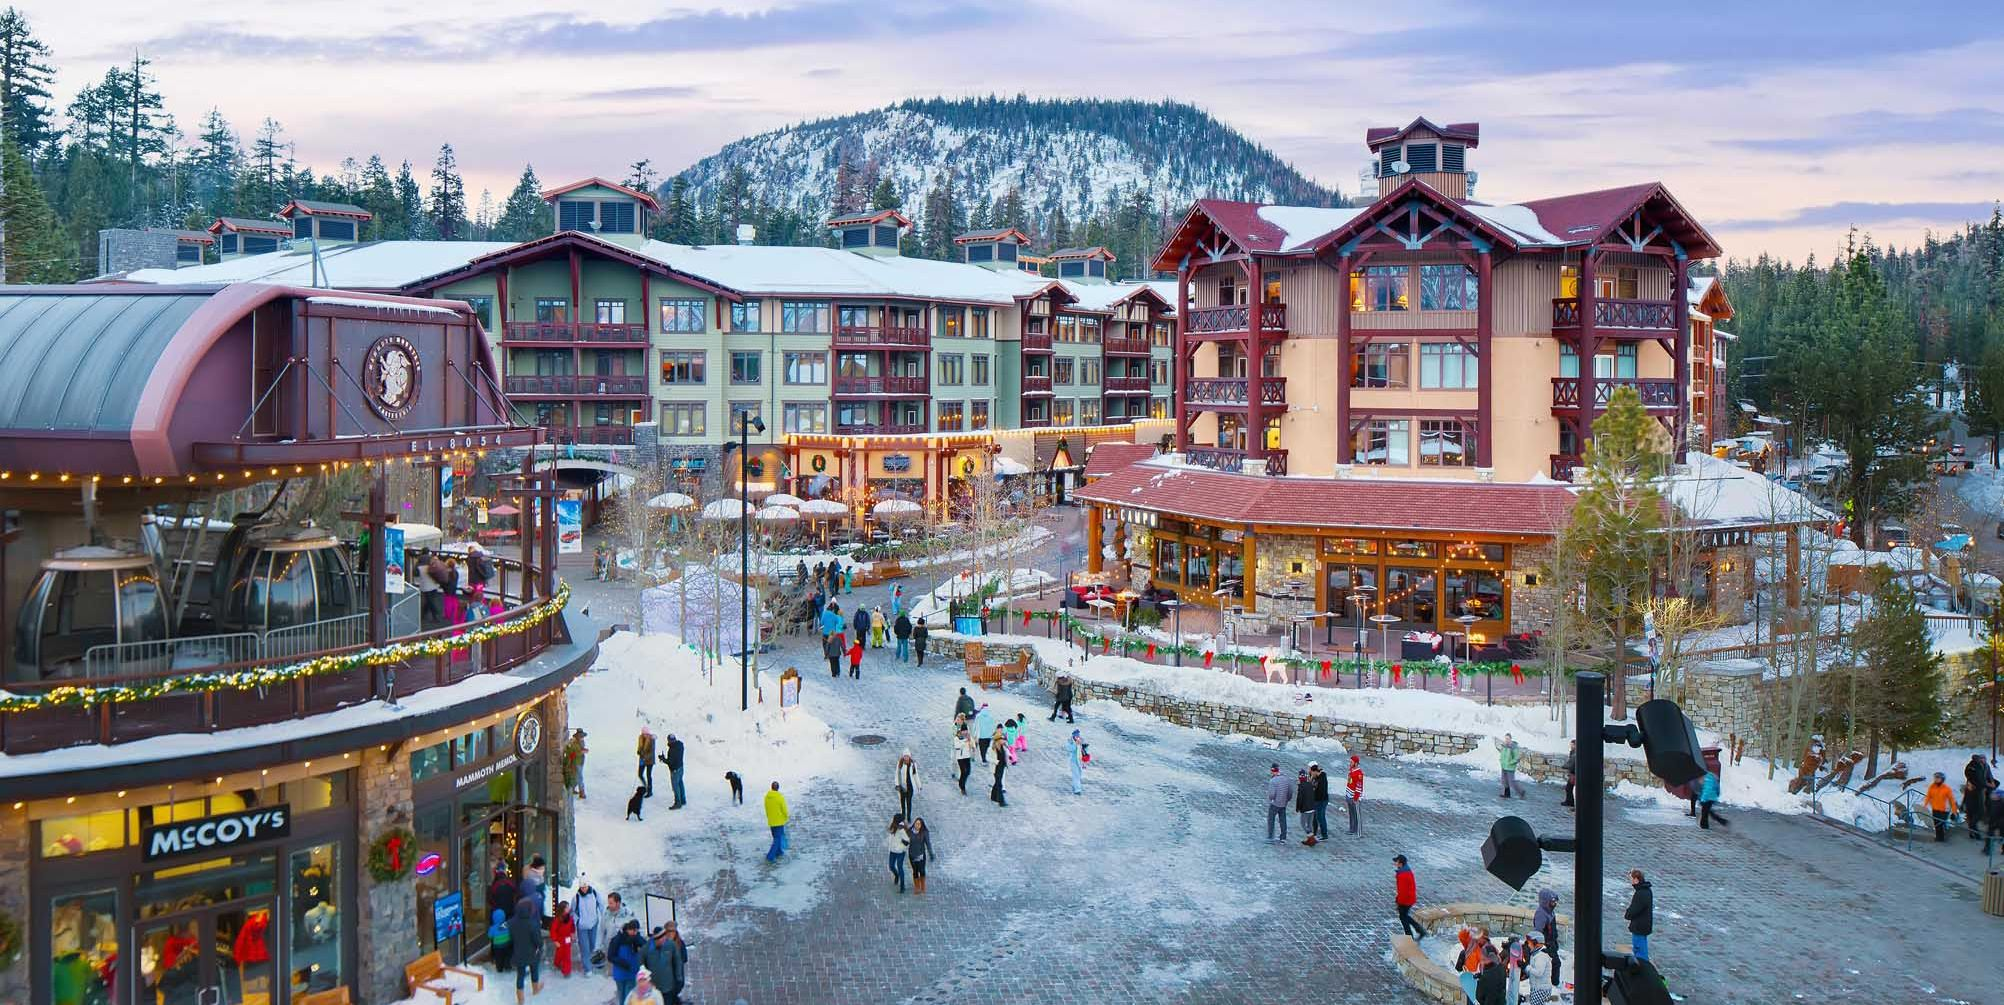 10 Best Winter Vacations Ideas 2019 Fun Cold Winter Getaways